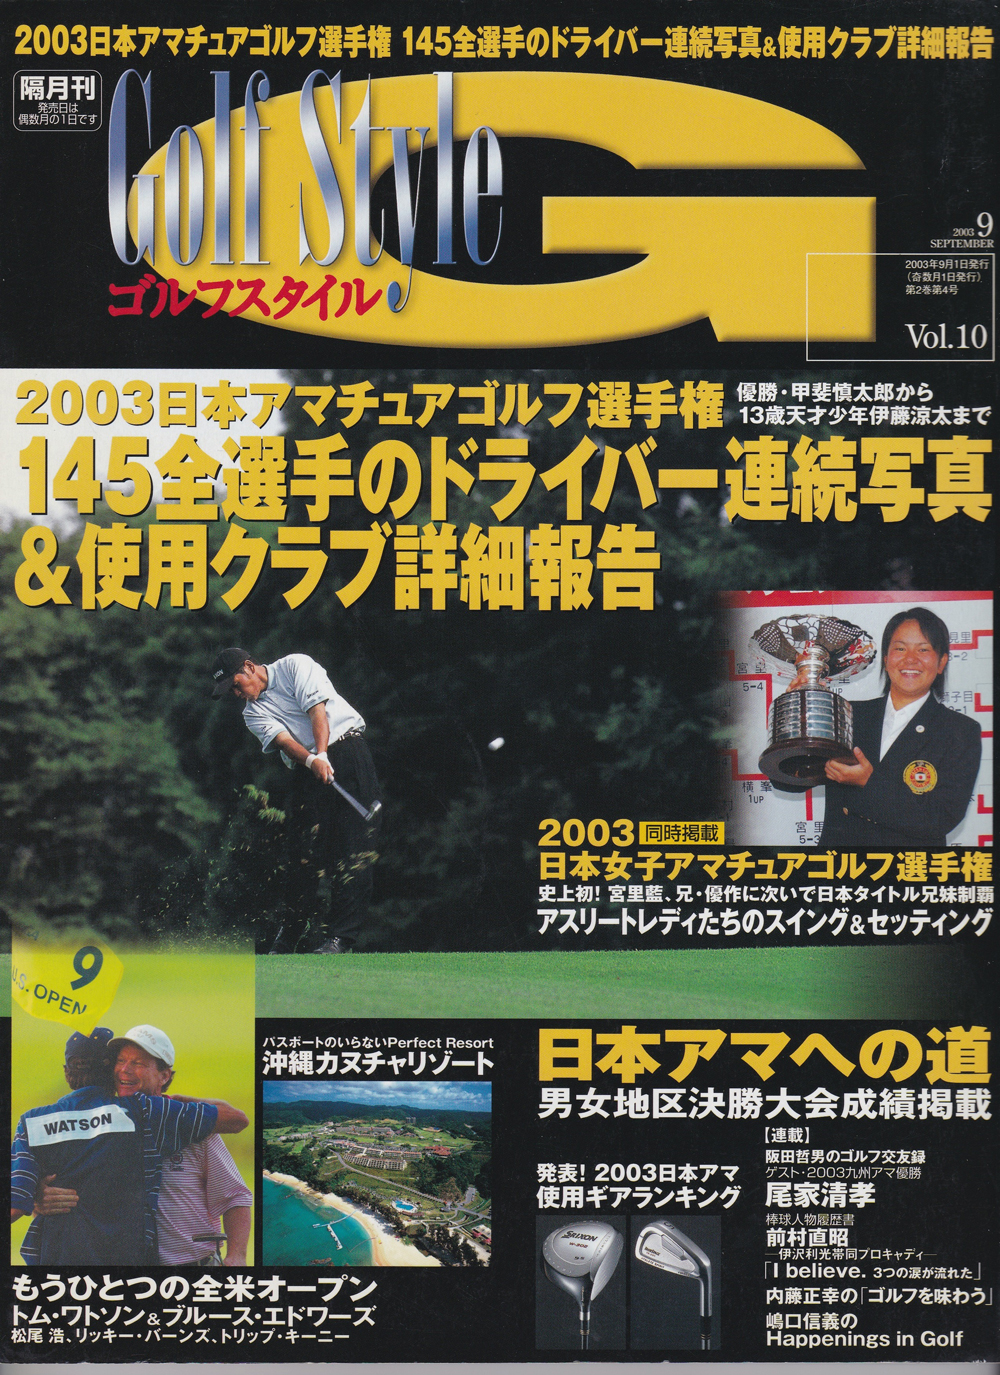 2003.9 Golf Style Japan women's amateur club's setting